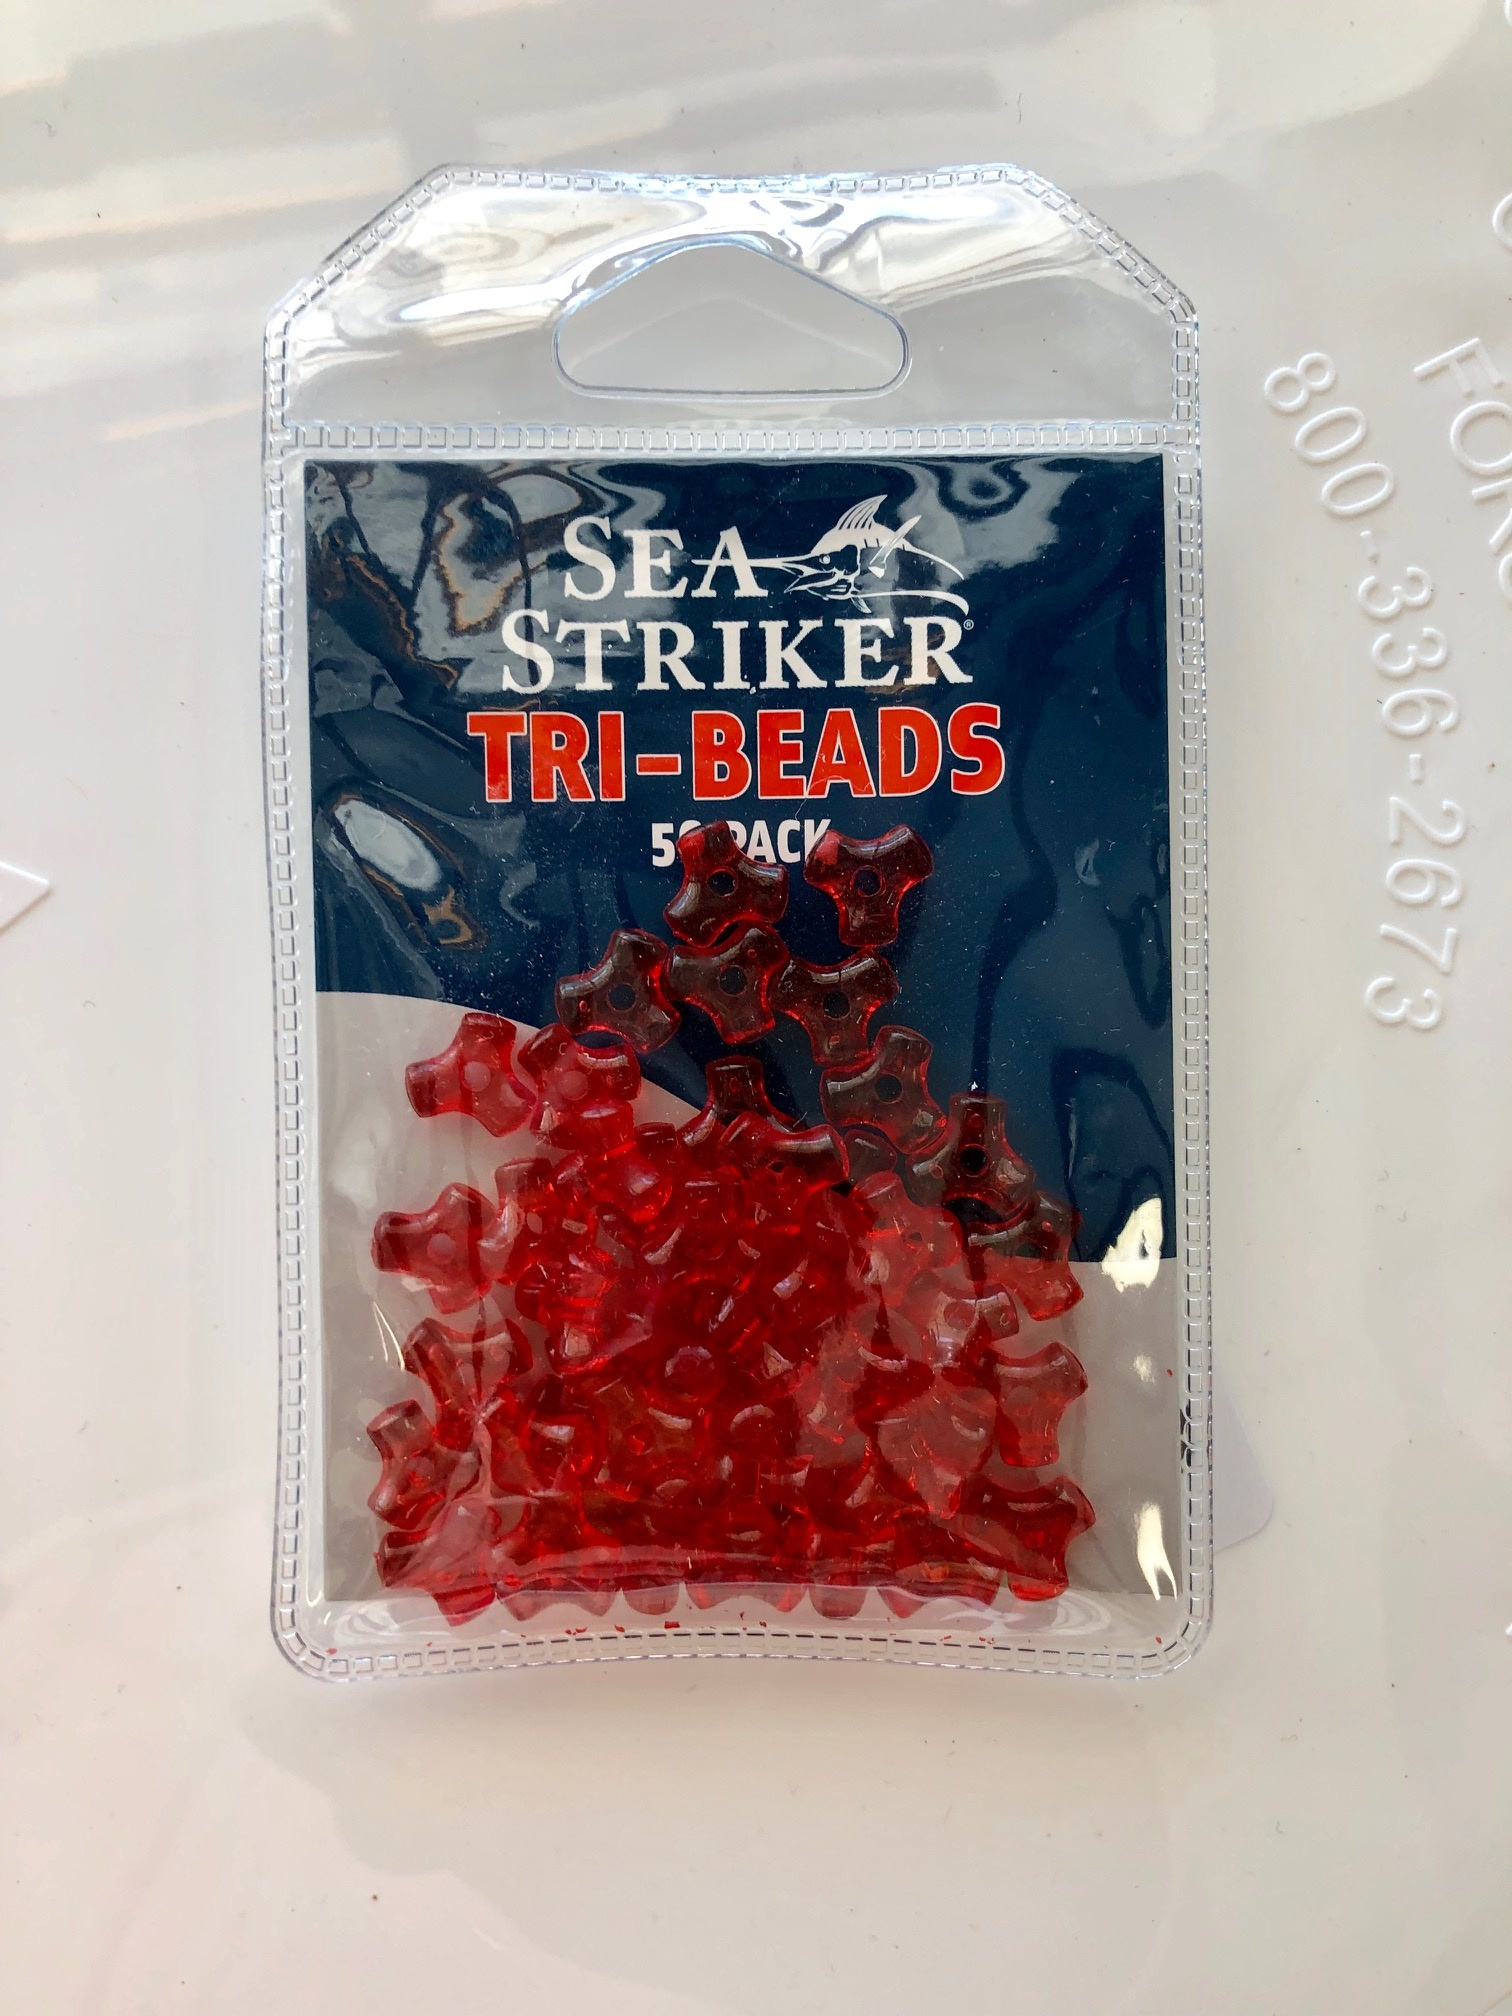 Sea Striker Tri-Beads 50 pack